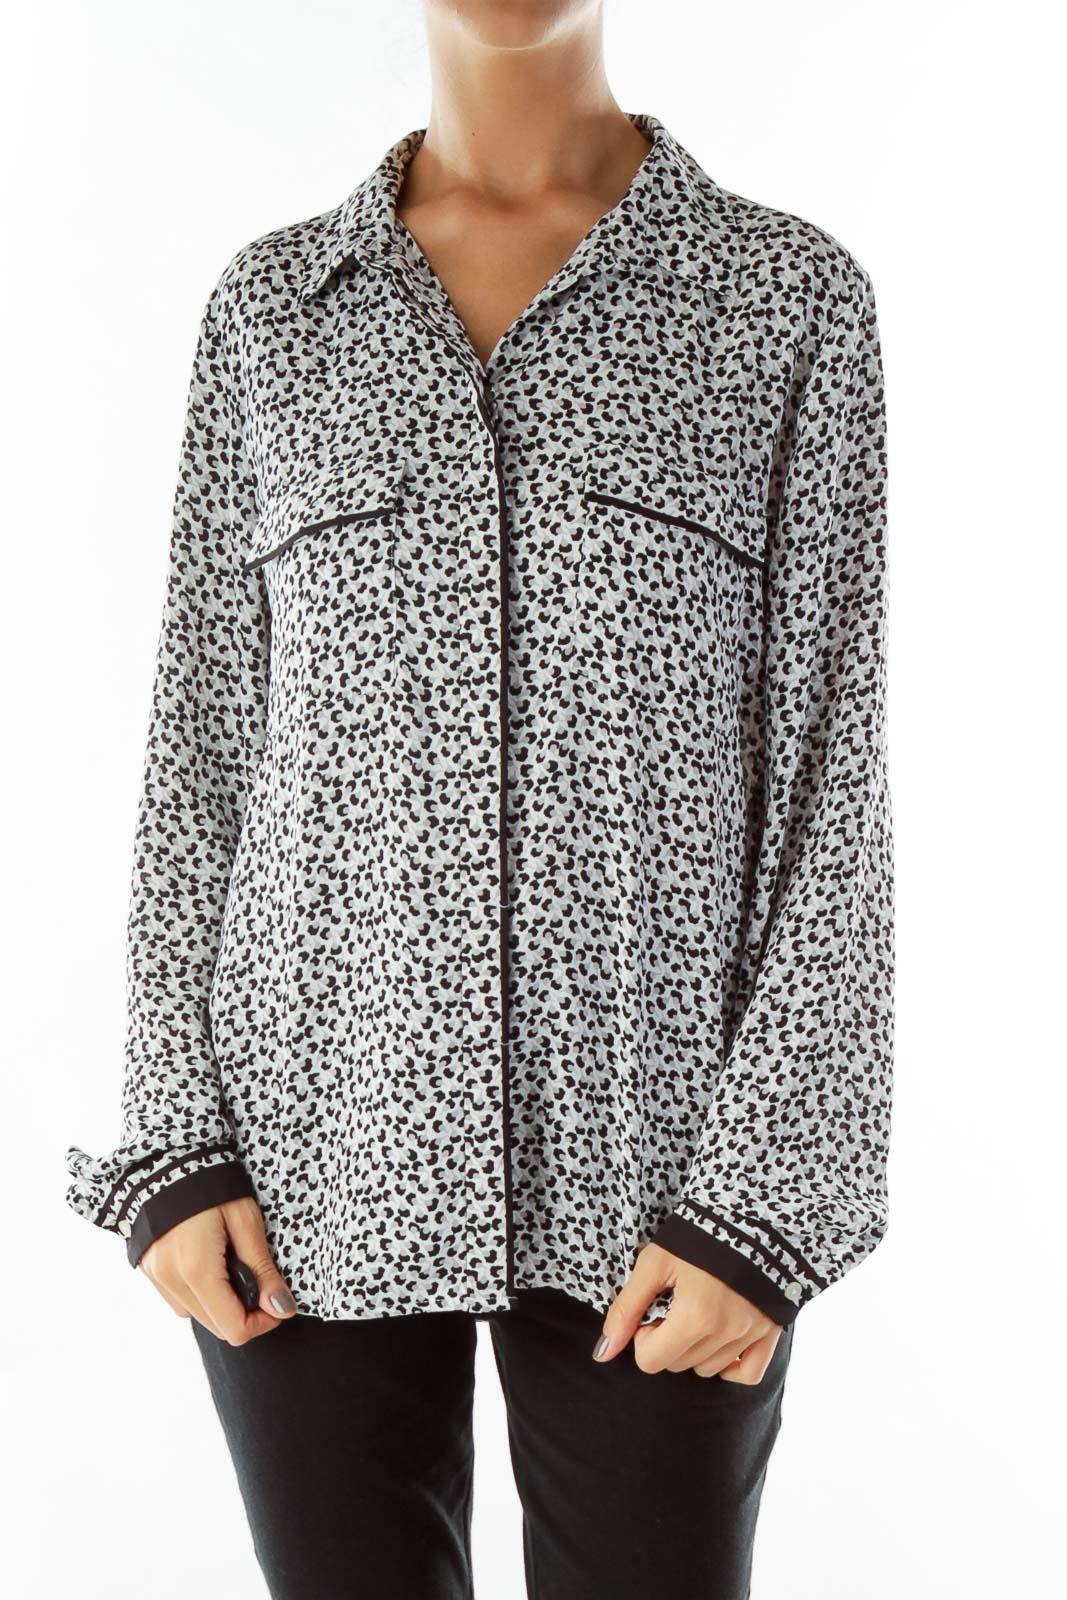 Black Gray Floral Print Shirt Front